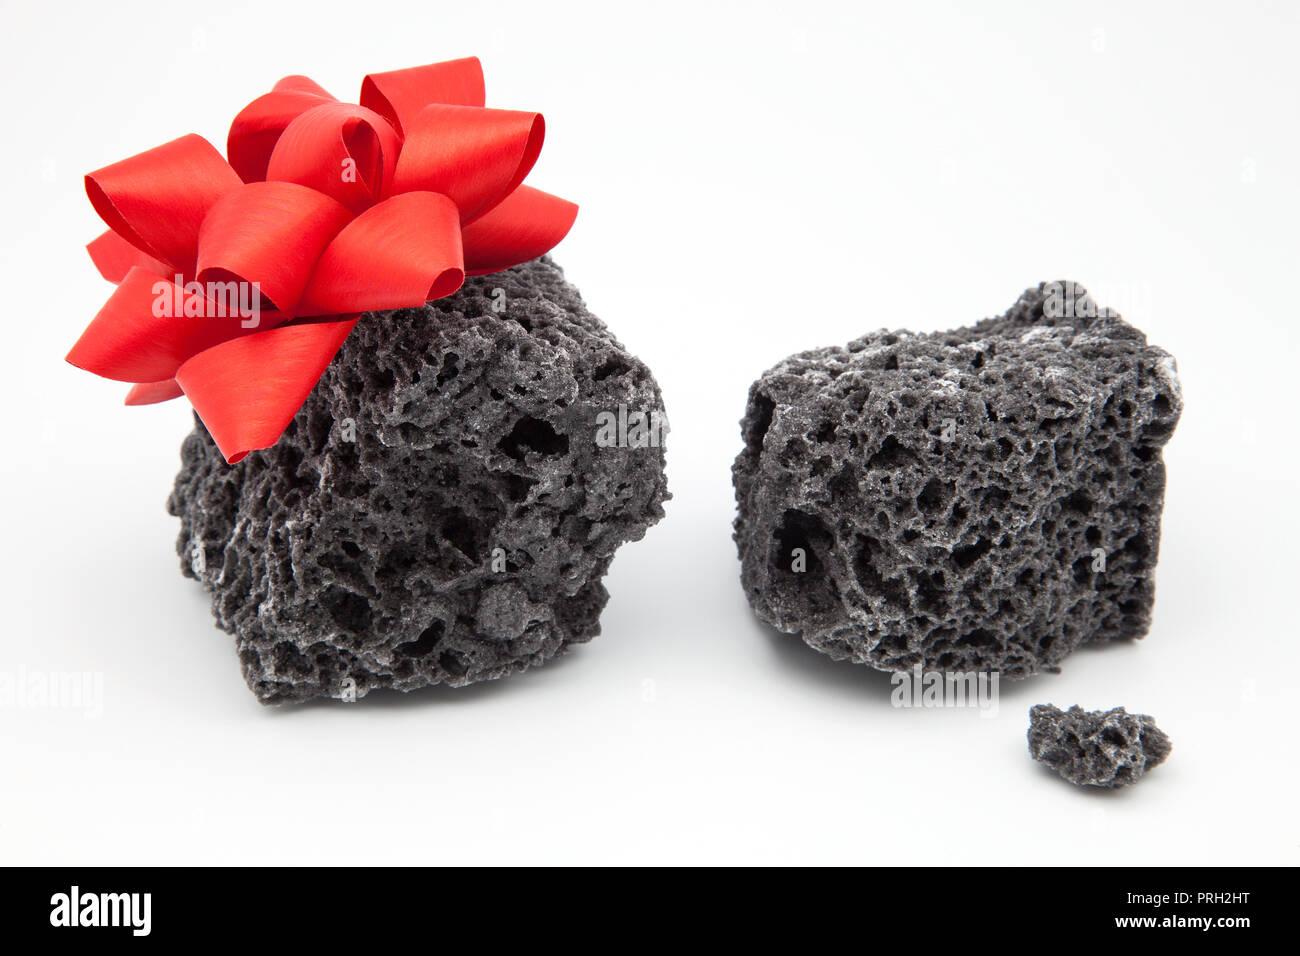 coal of gift for Christmas Stock Photo: 221036756 - Alamy